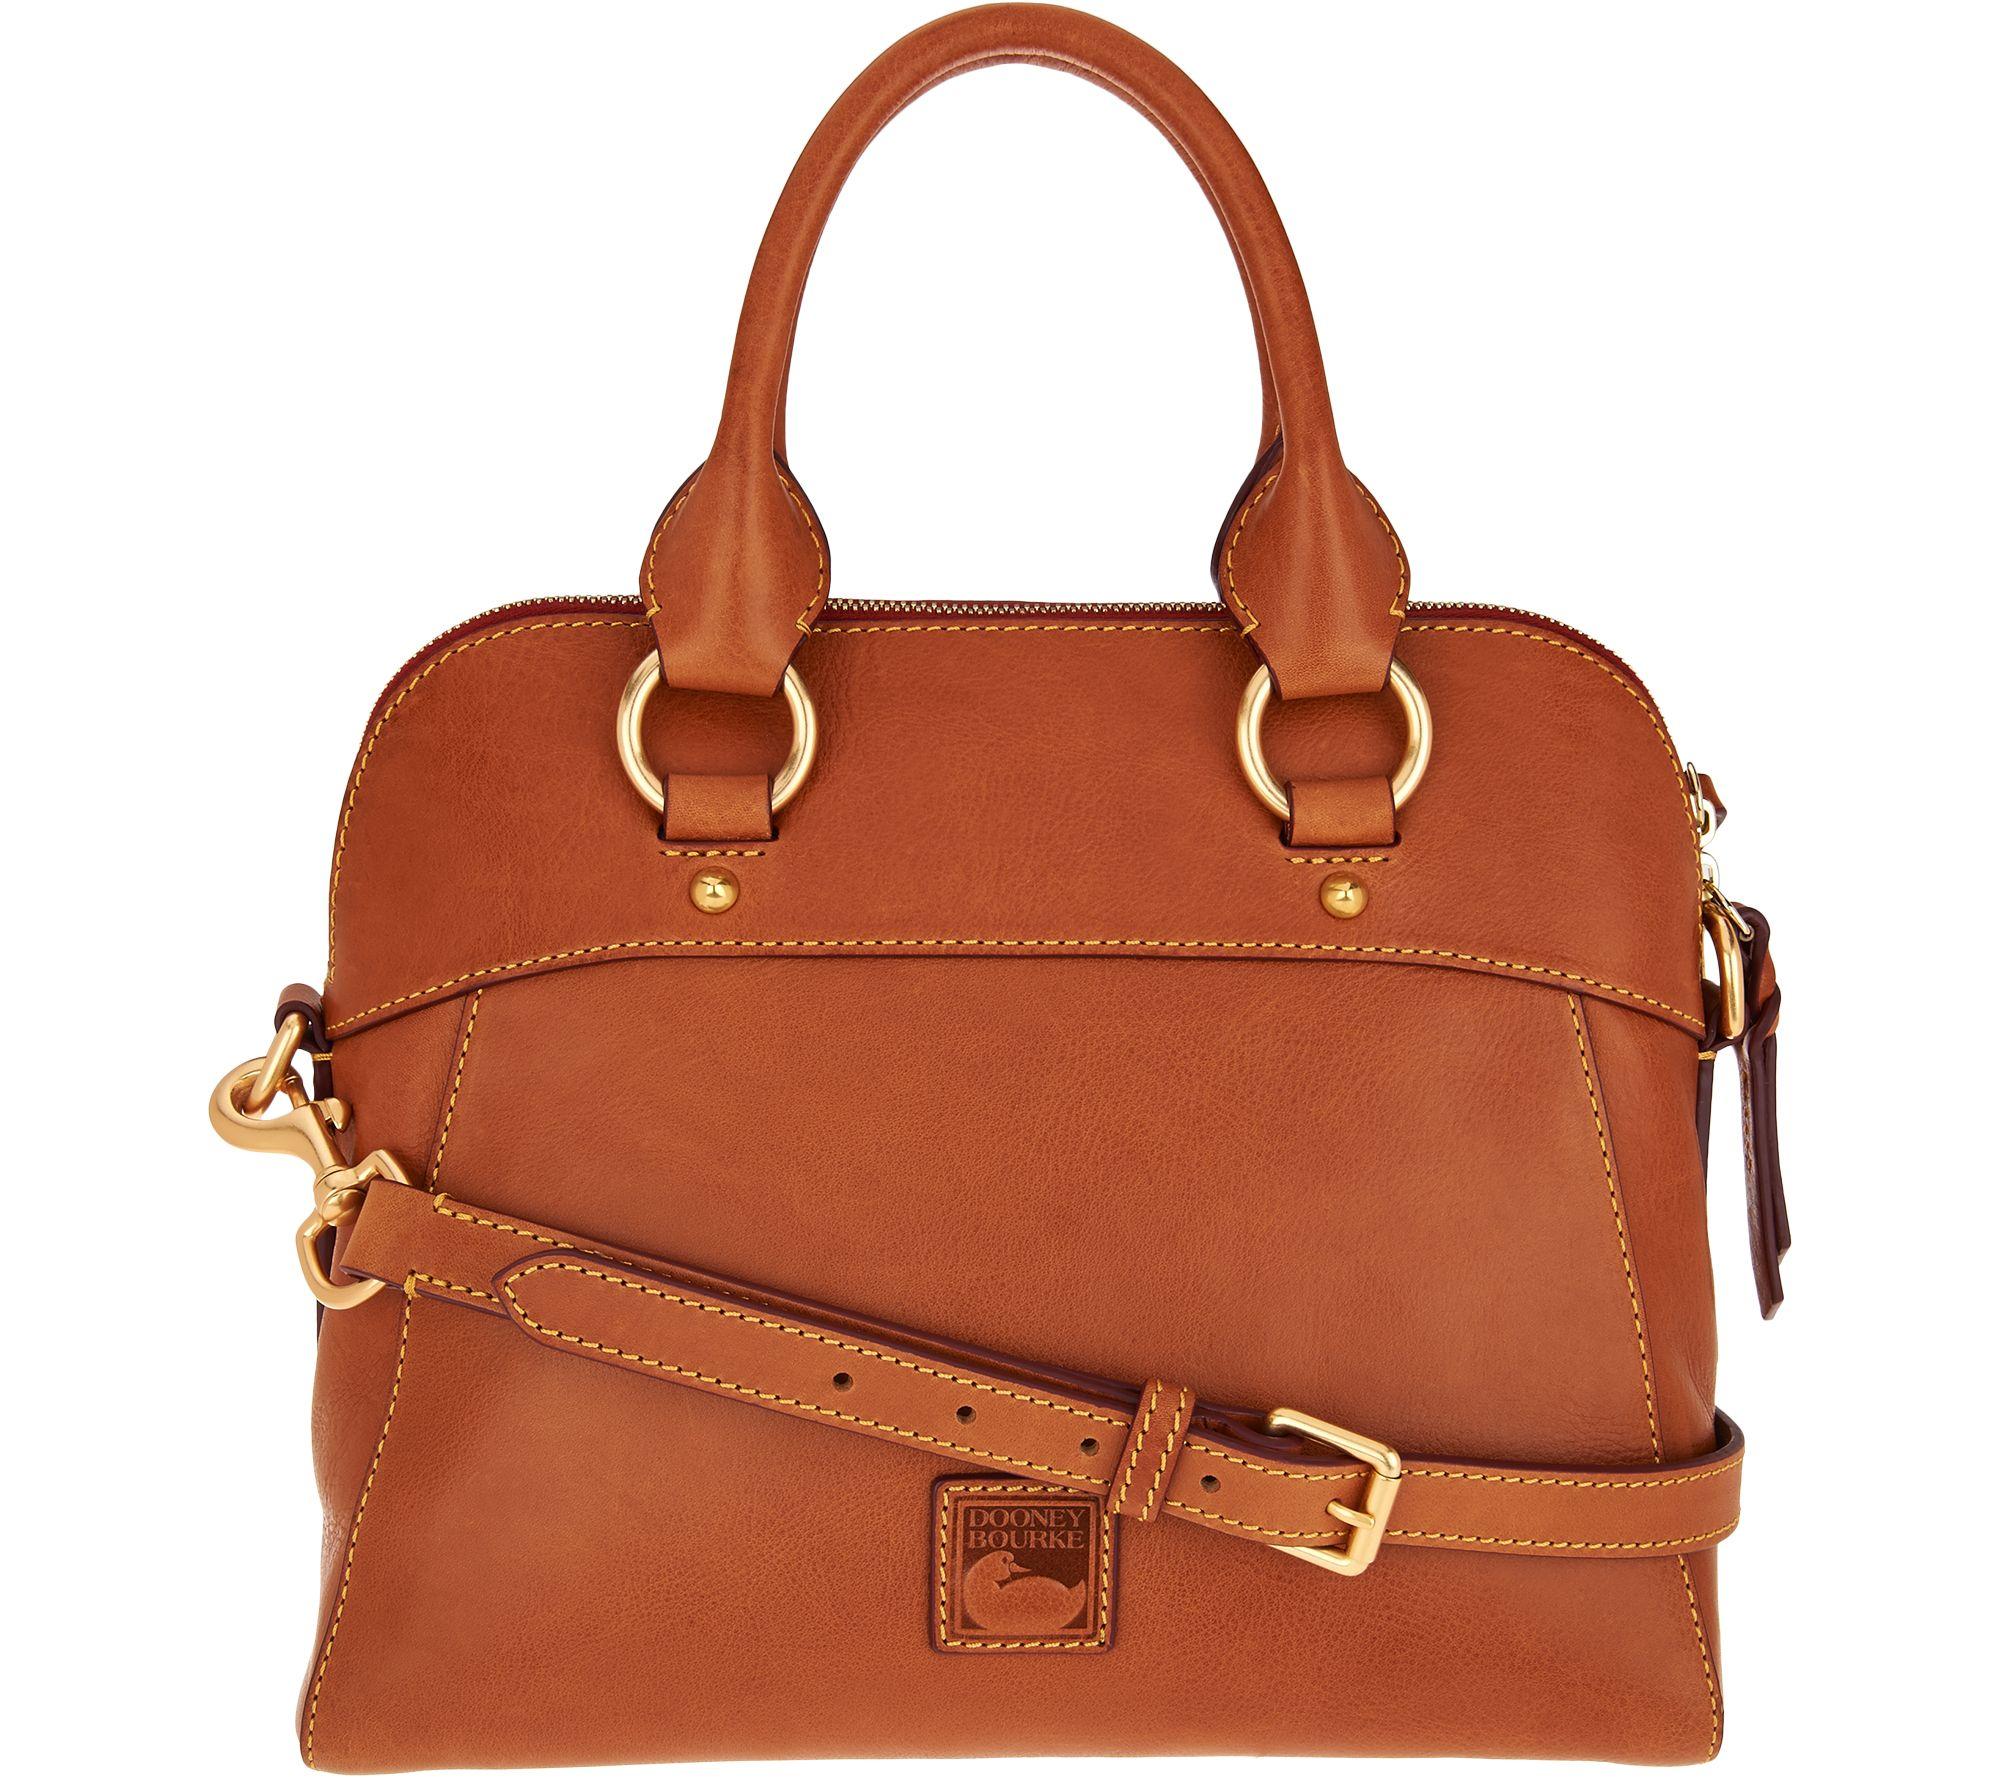 b19ab12f8 Dooney & Bourke Florentine Satchel Handbag -Cameron - Page 1 — QVC.com